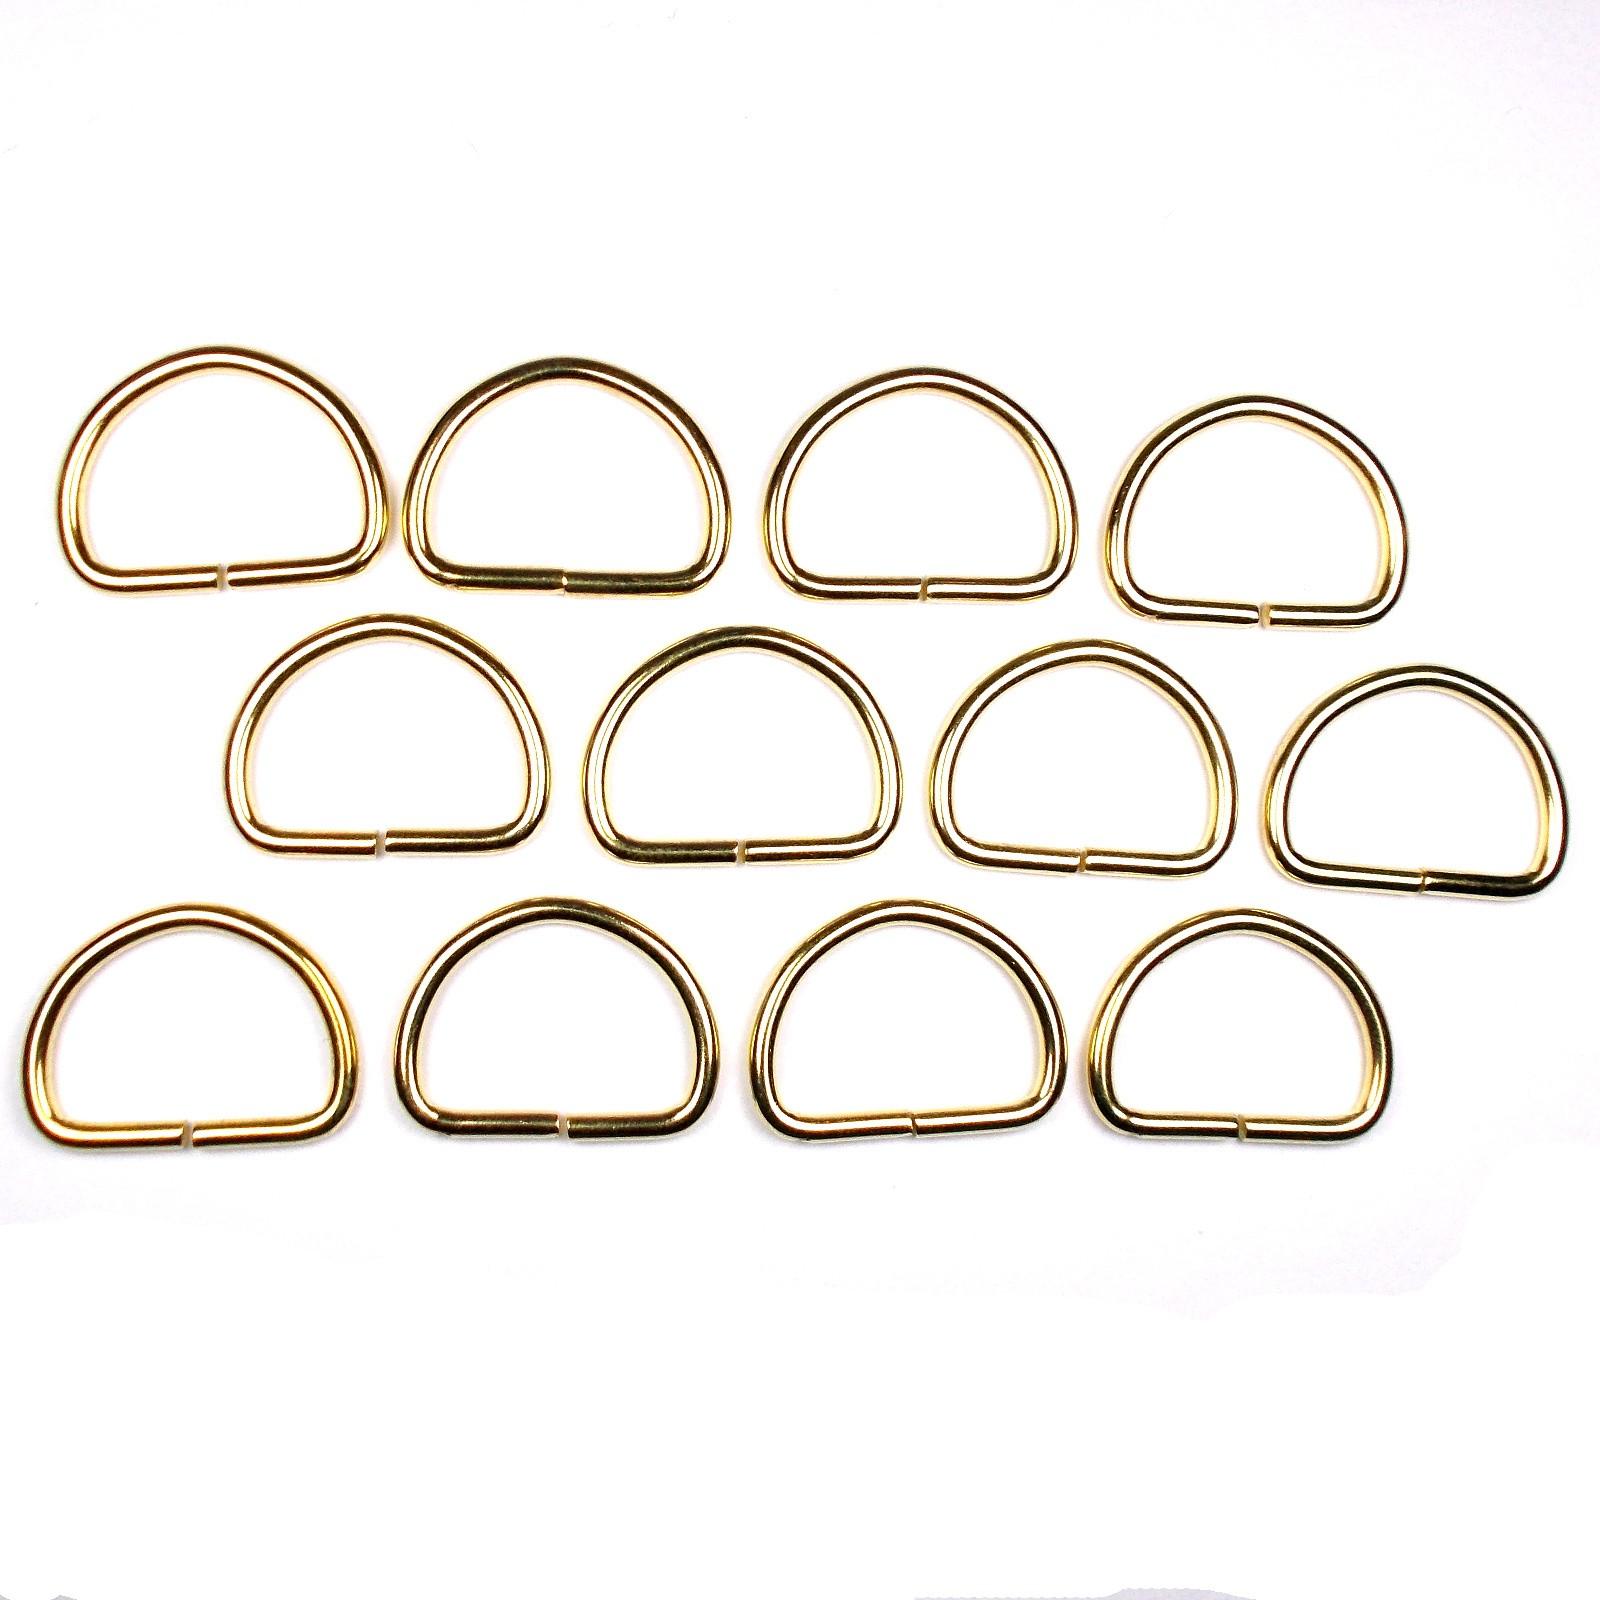 Gold Metal D Rings 26mm Pack of 12